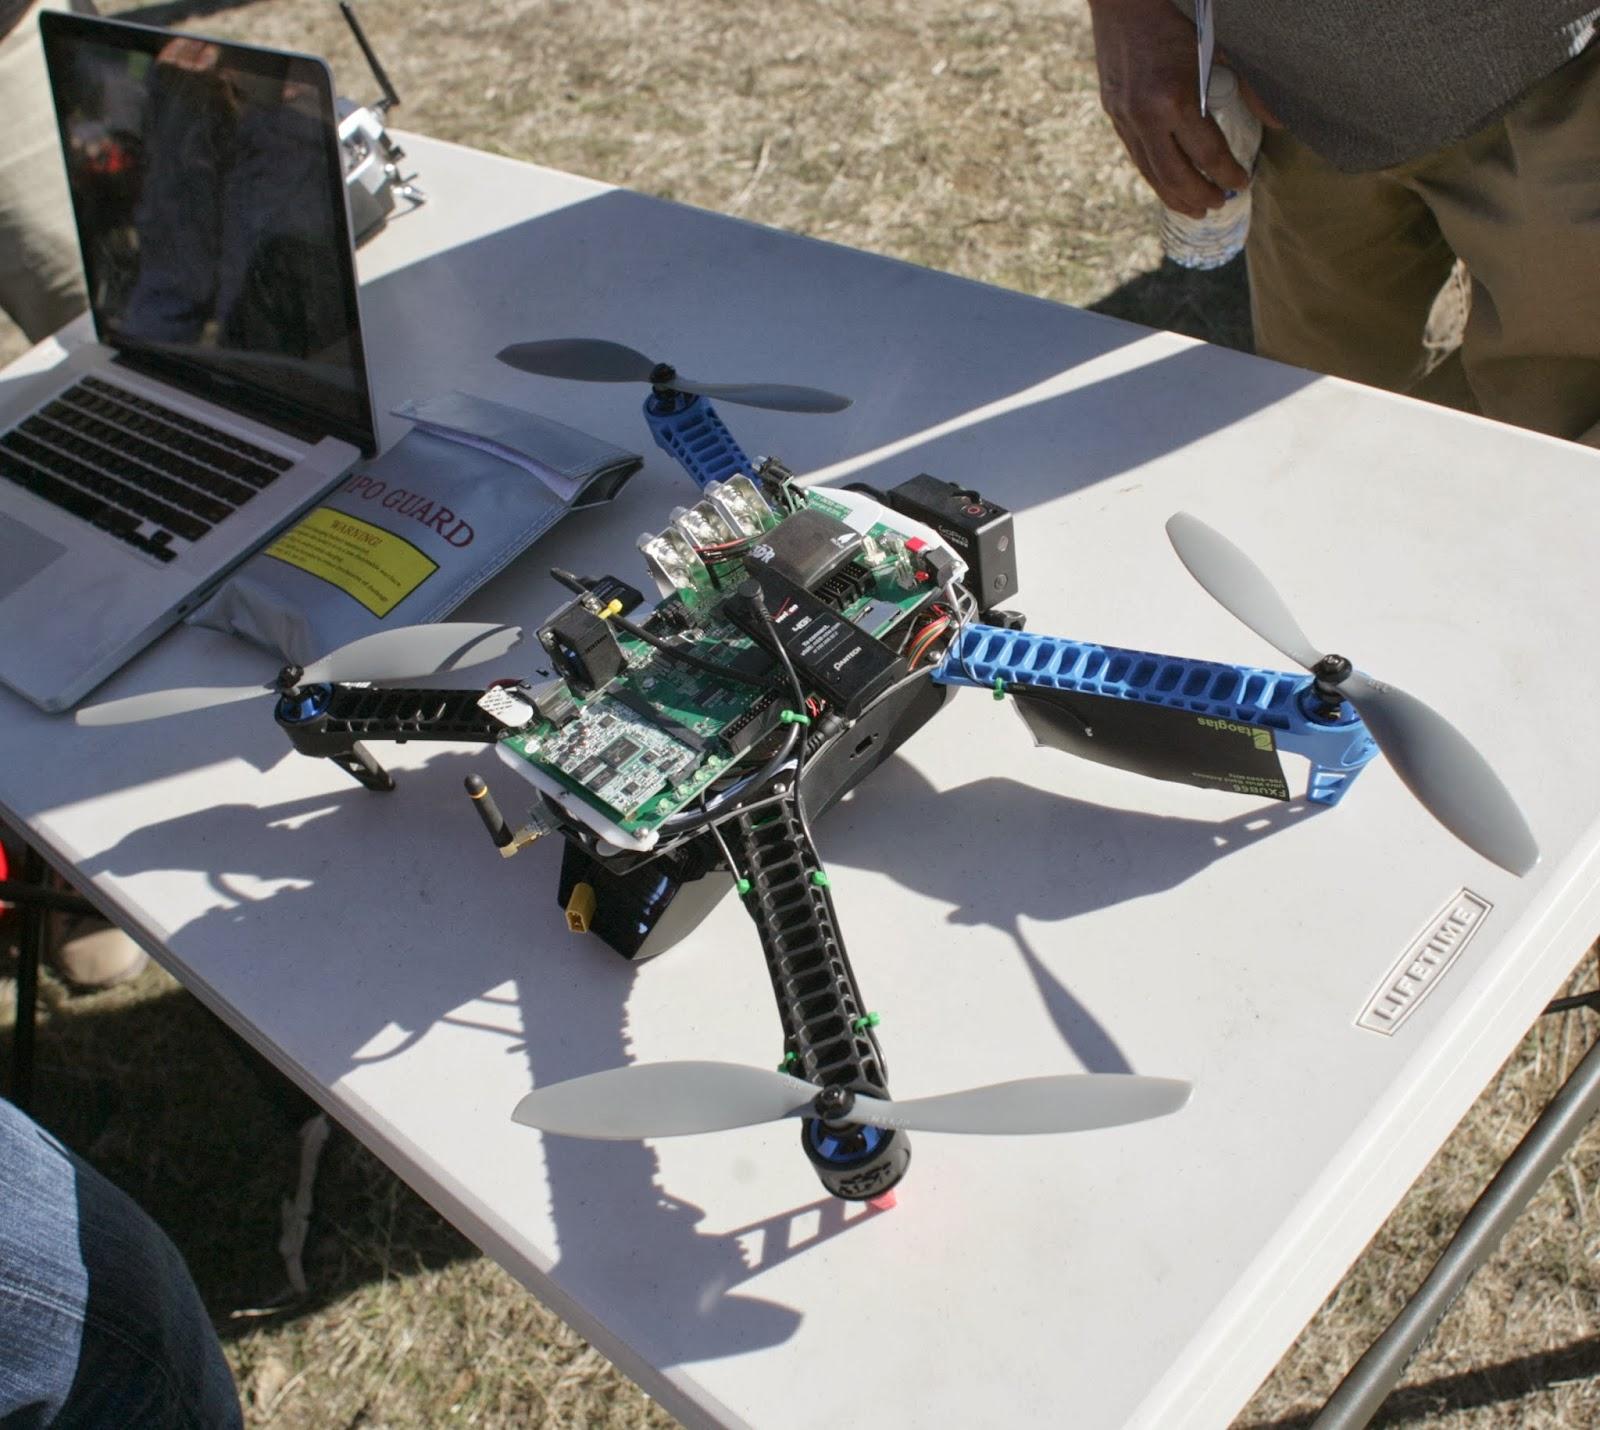 drones03.jpg